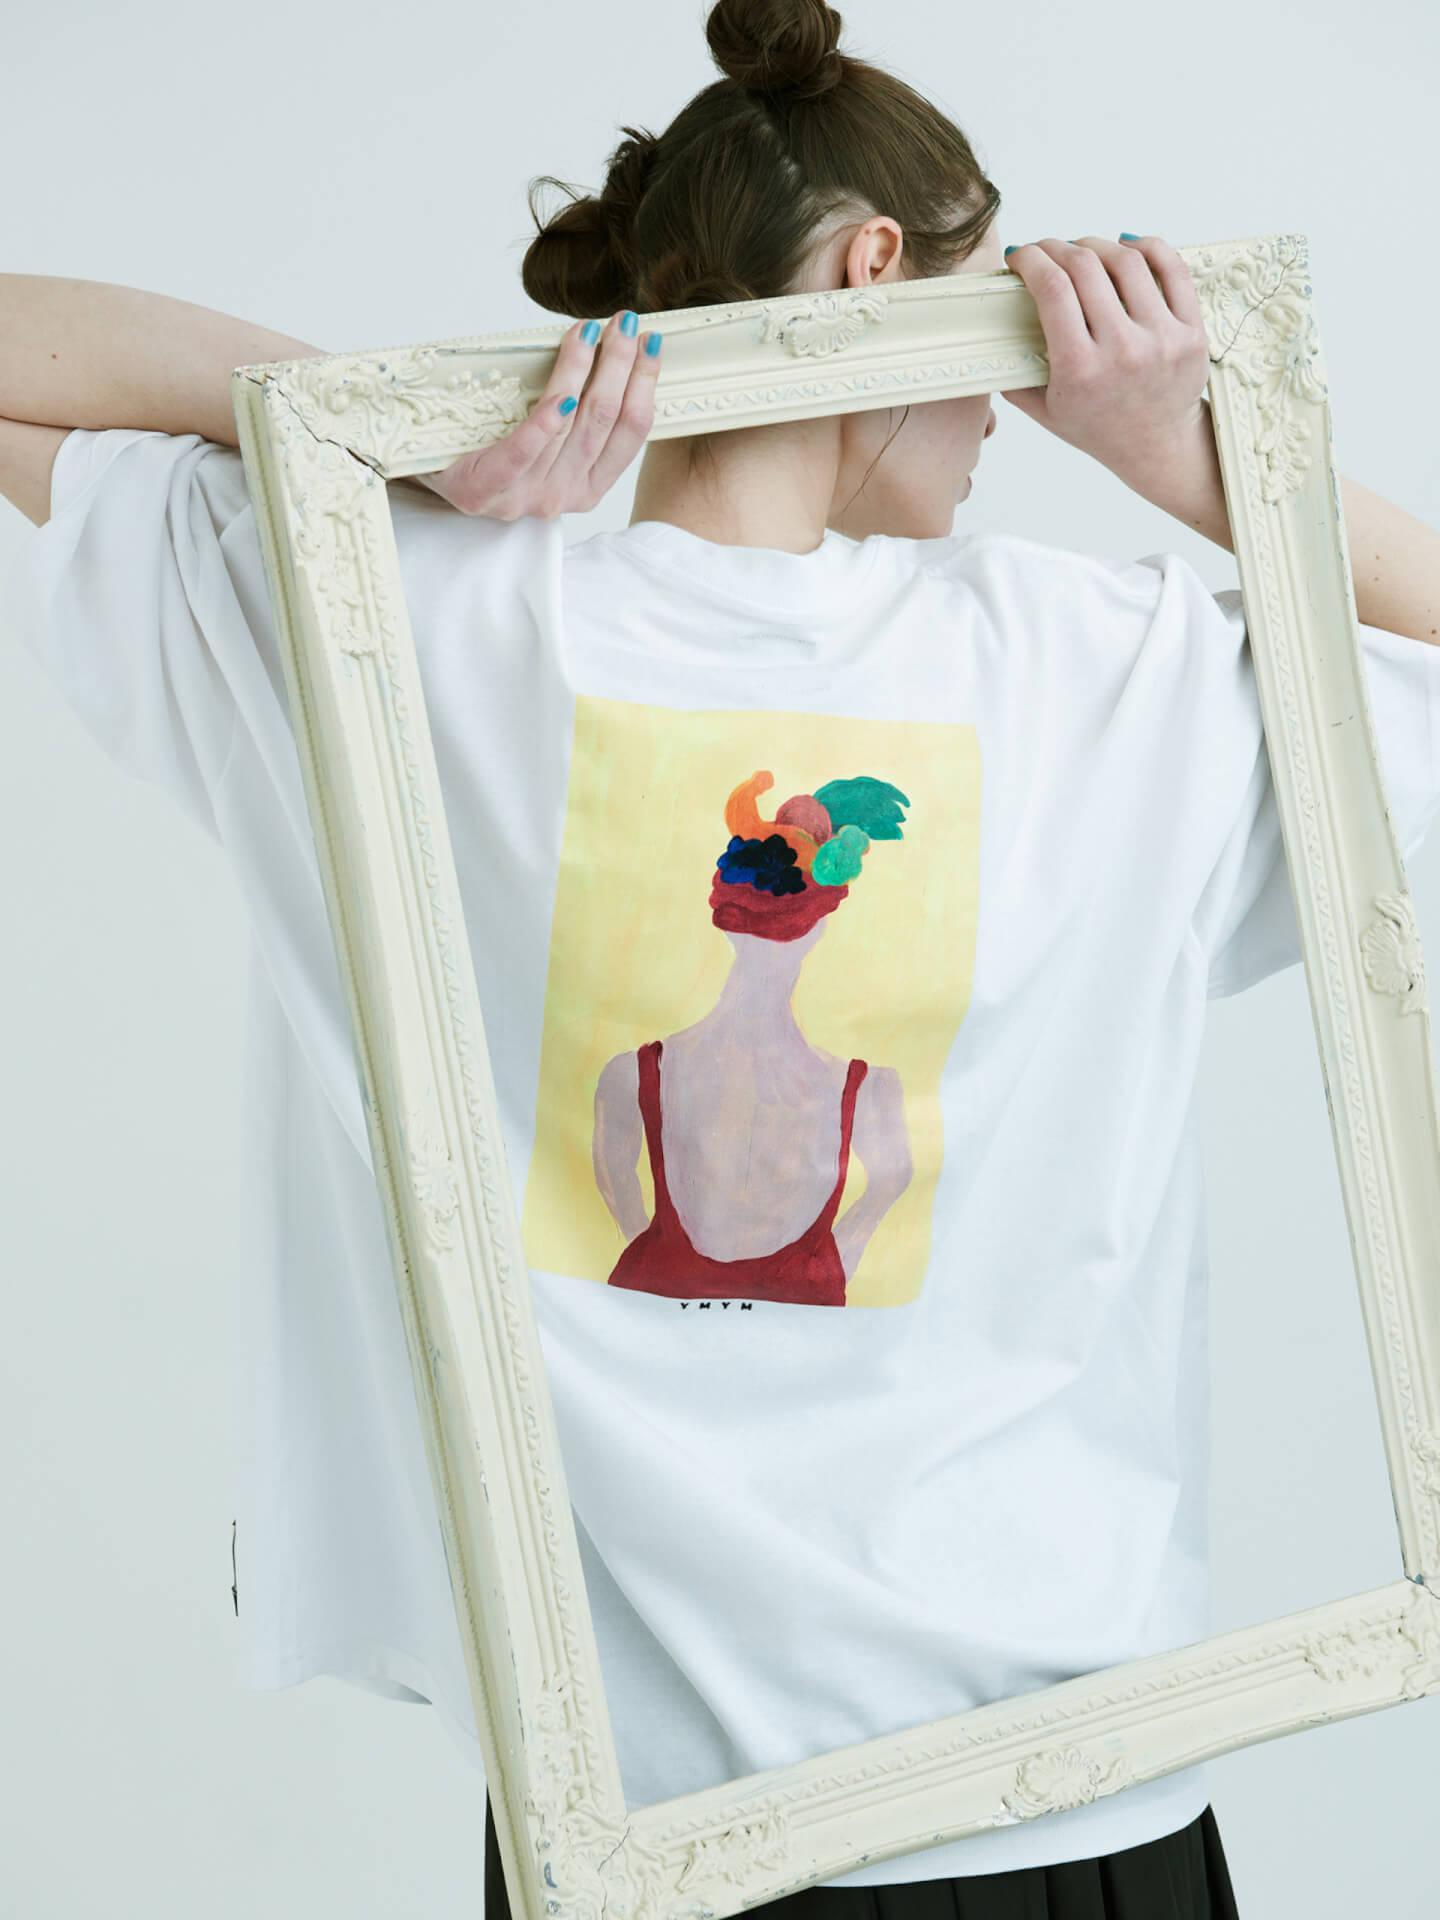 CHAIのベーシスト・YUUKIによるプロジェクト「YMYM」よりファッションブランドオープン!2021年春夏コレクション&描き下ろし絵画などの展示会も life210405_ymym_8